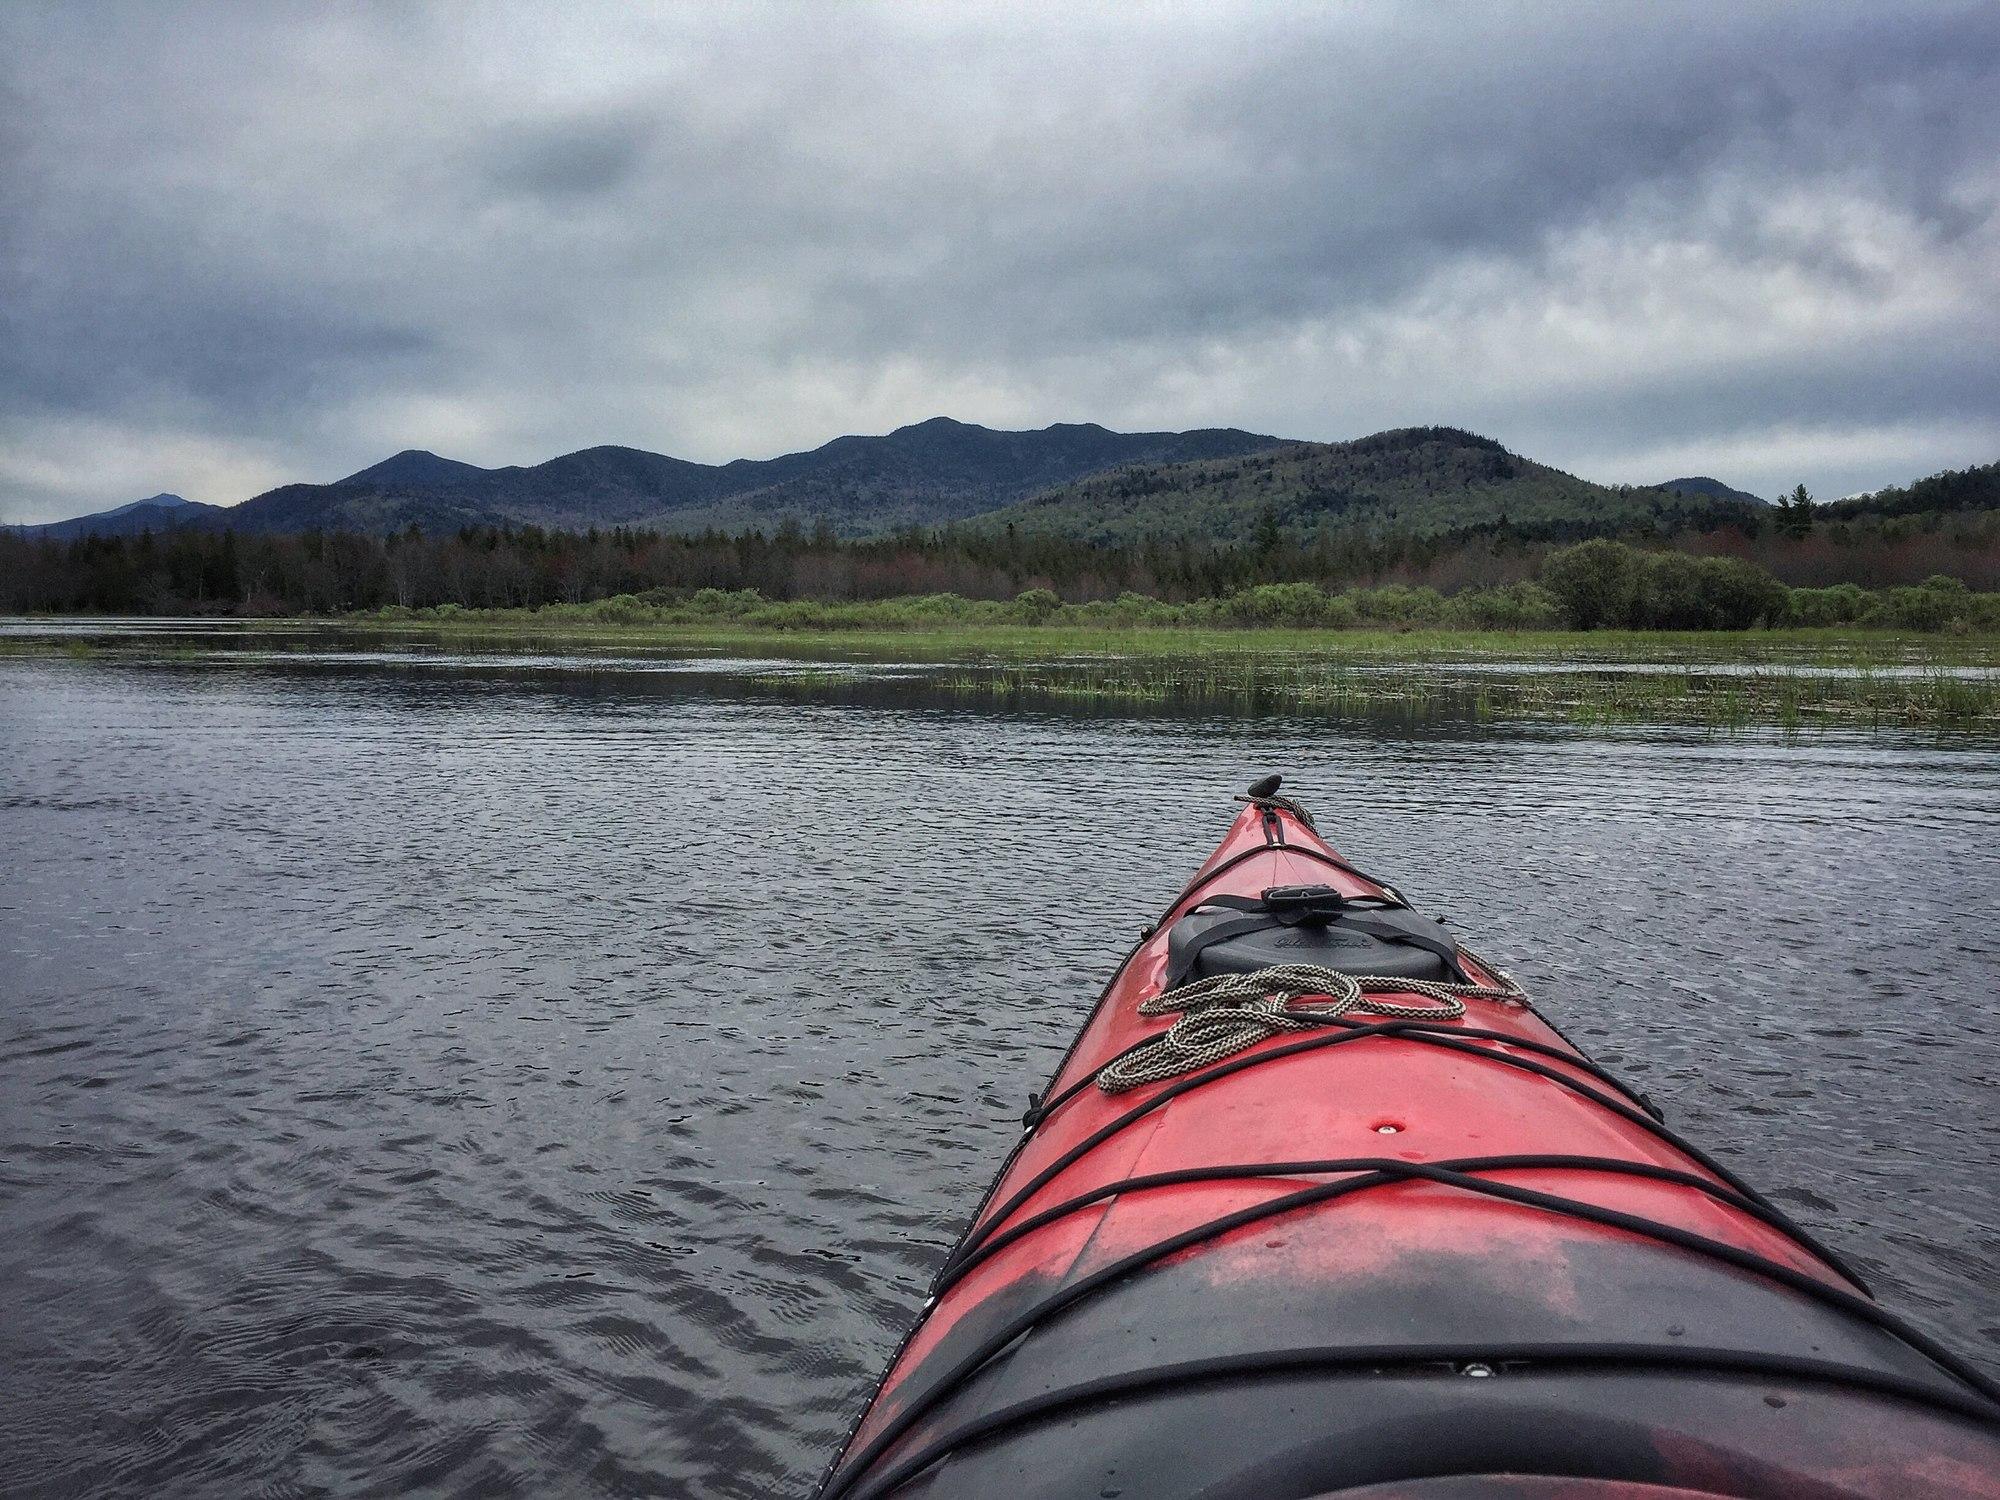 DEC Adirondack Outdoor Recreation Weekly Bulletin - 5/31/18